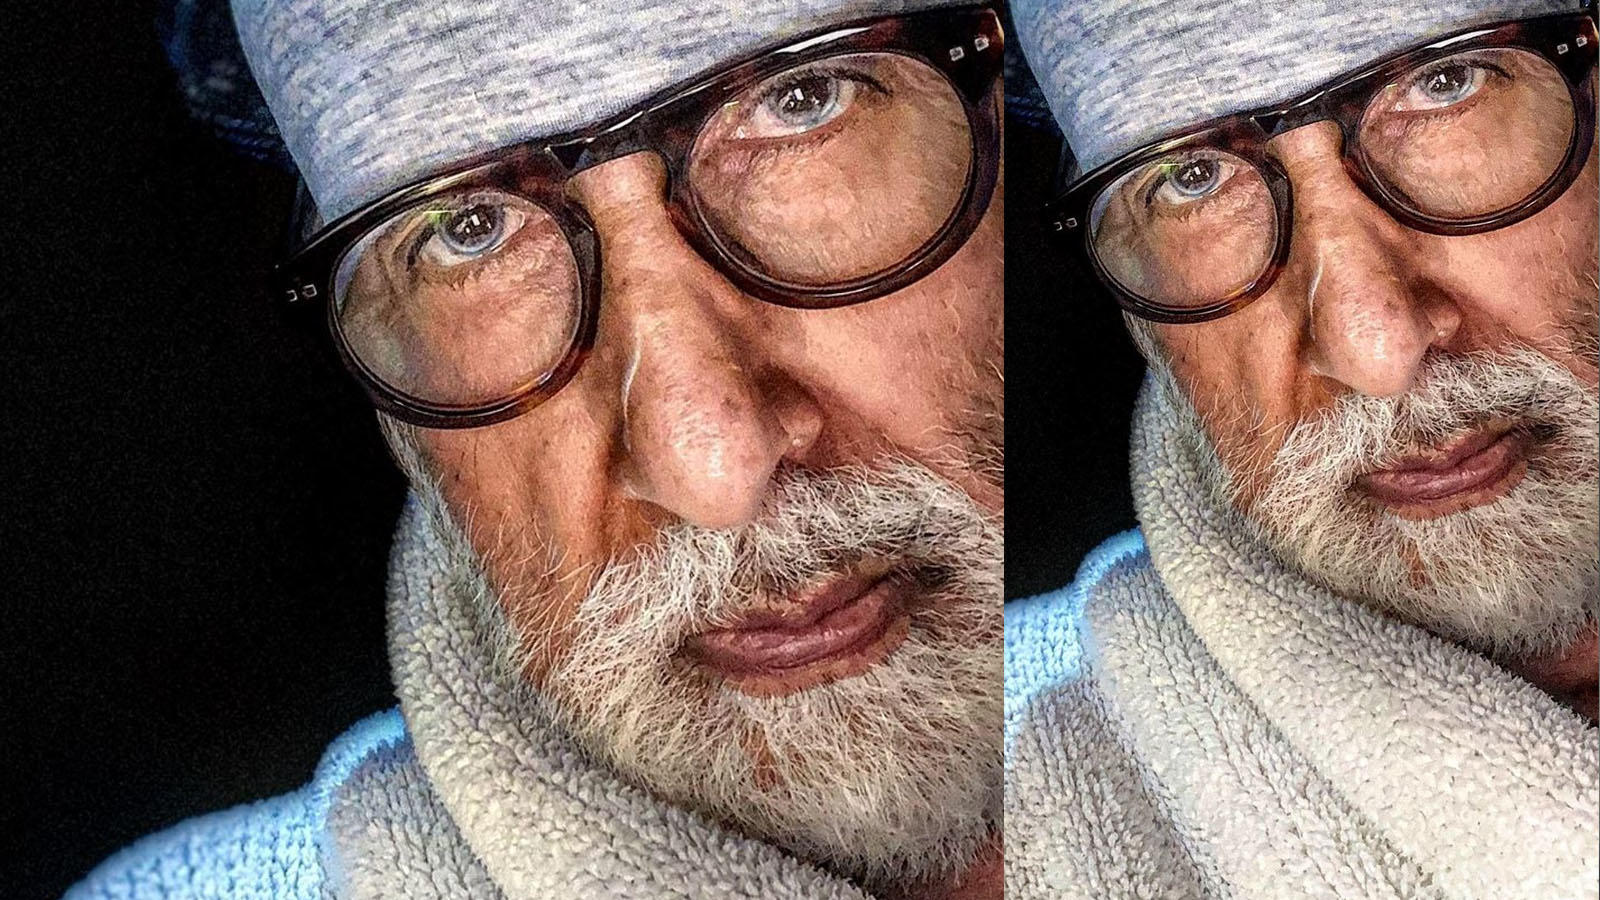 amitabh-bachchan-treats-fans-with-an-intense-selfie-amid-covid-19-lockdown